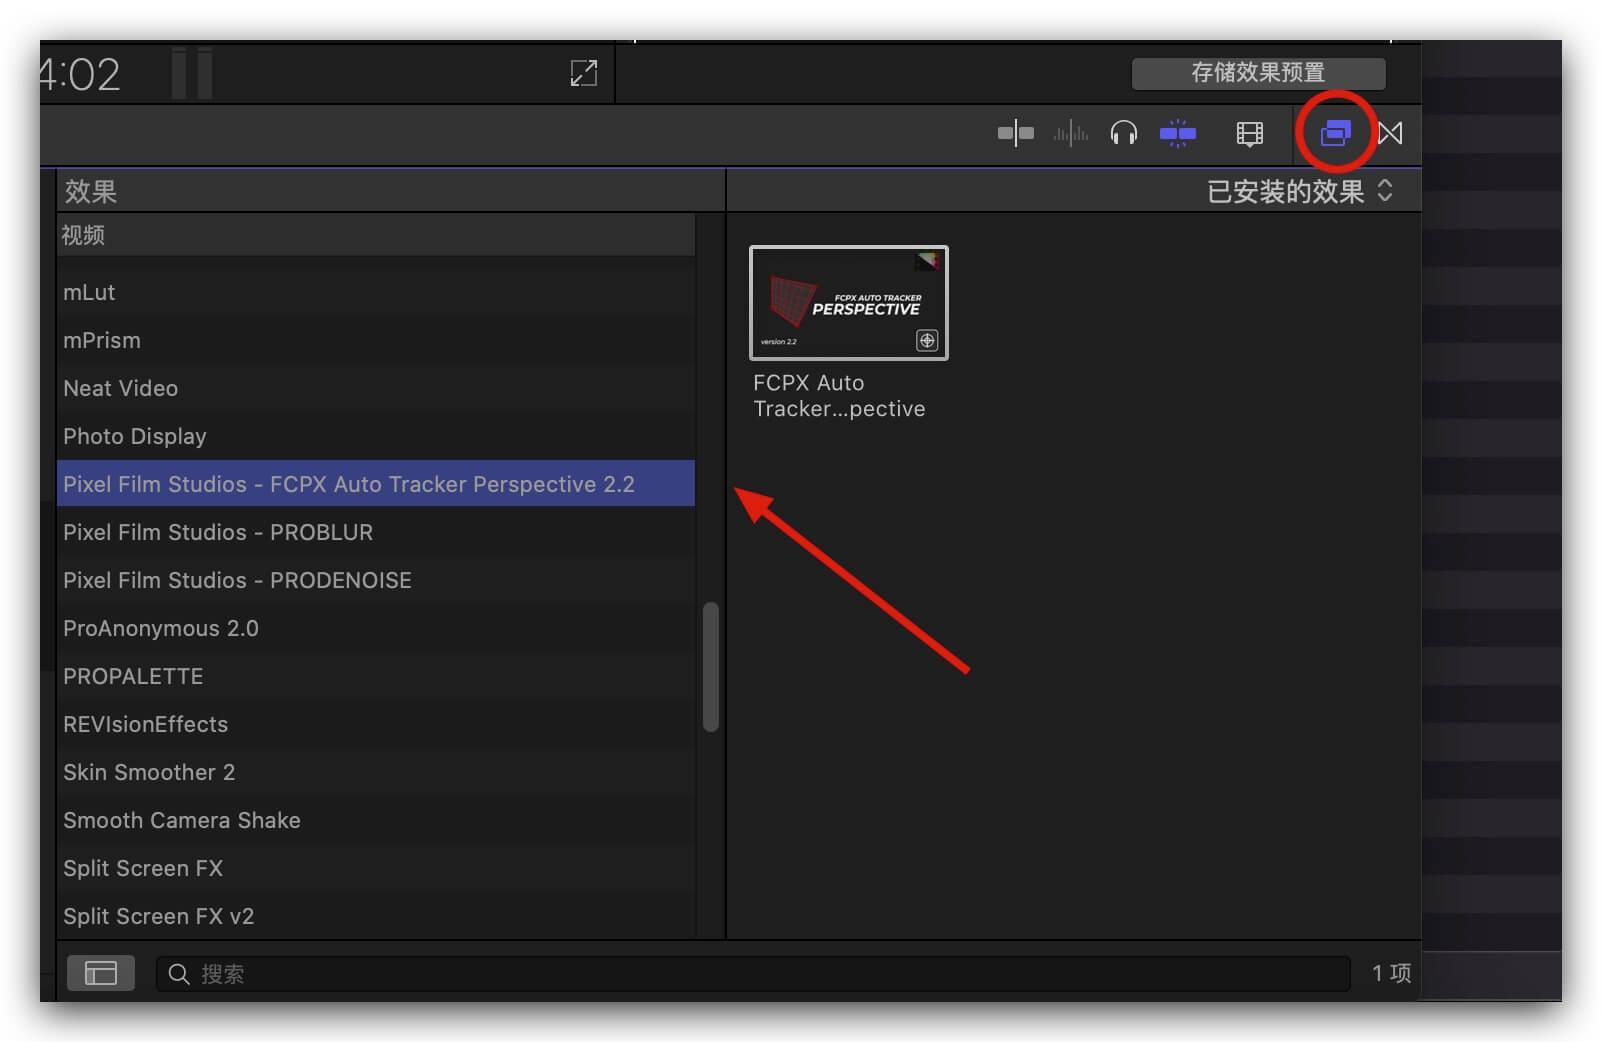 fcpx插件 四点平面自动跟踪透视特效 支持 fcpx 10.5.2 Auto Tracker Perspective 2.2